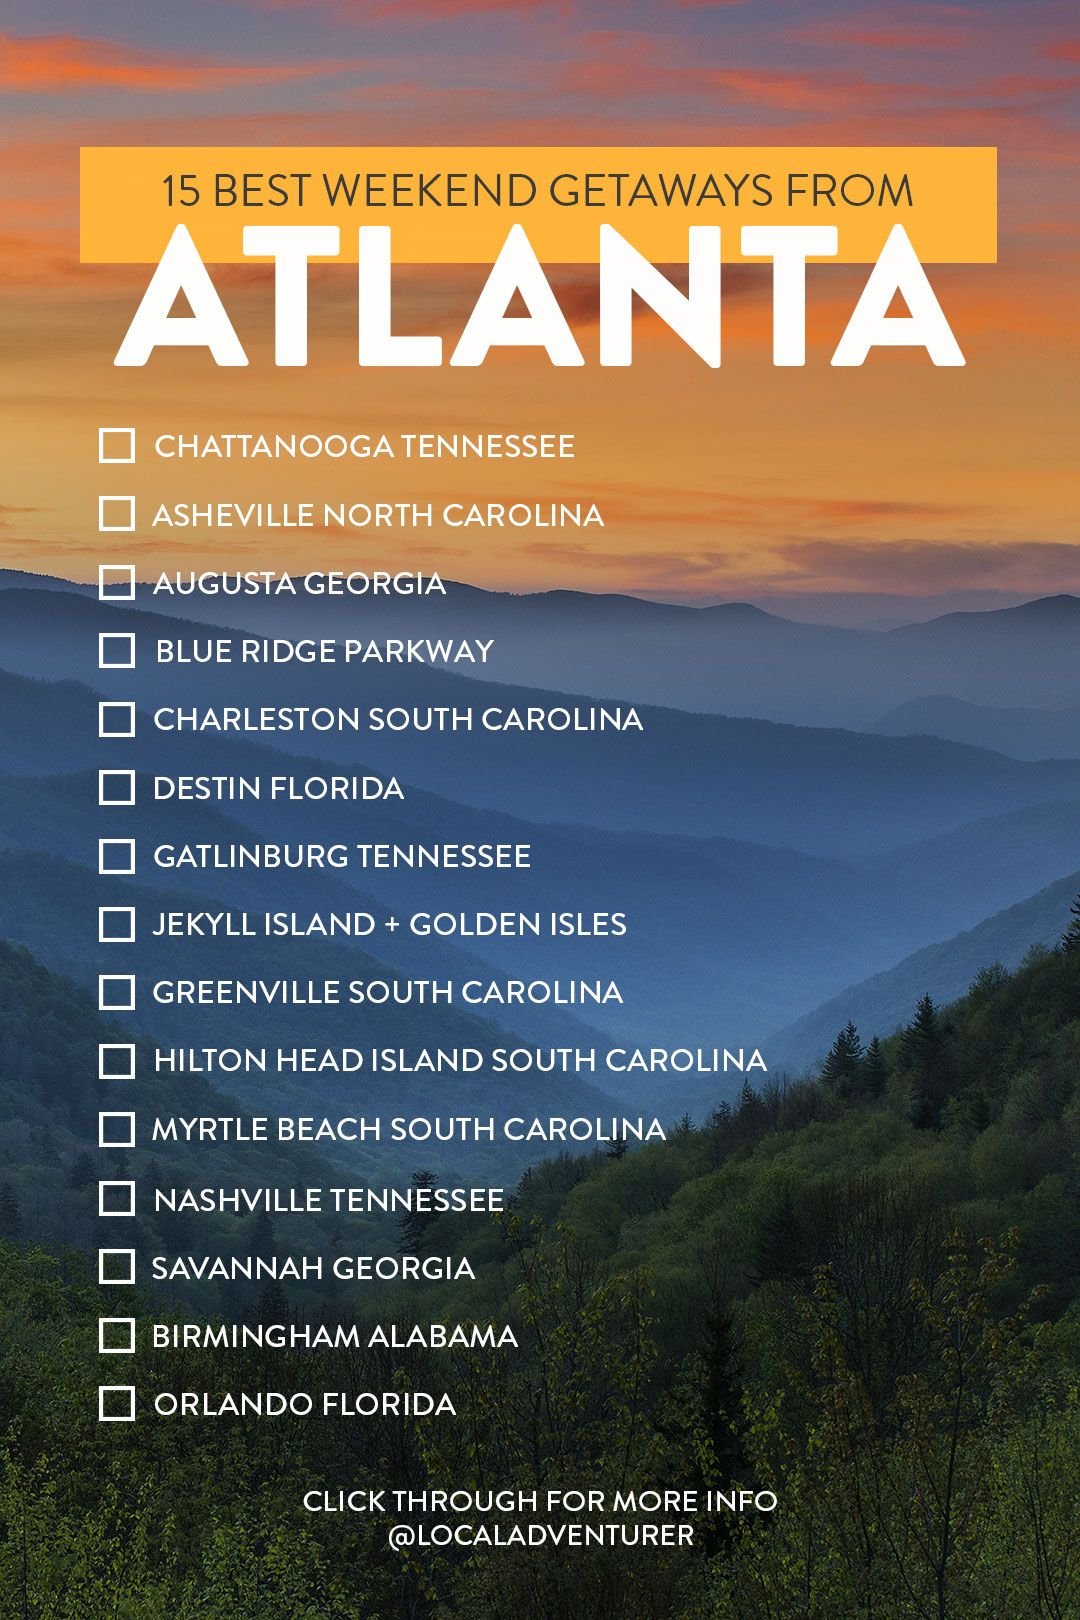 15 Best Weekend Trips From Atlanta Georgia A Guide To Great Getaways Best Weekend Trips Georgia Vacation Georgia Travel